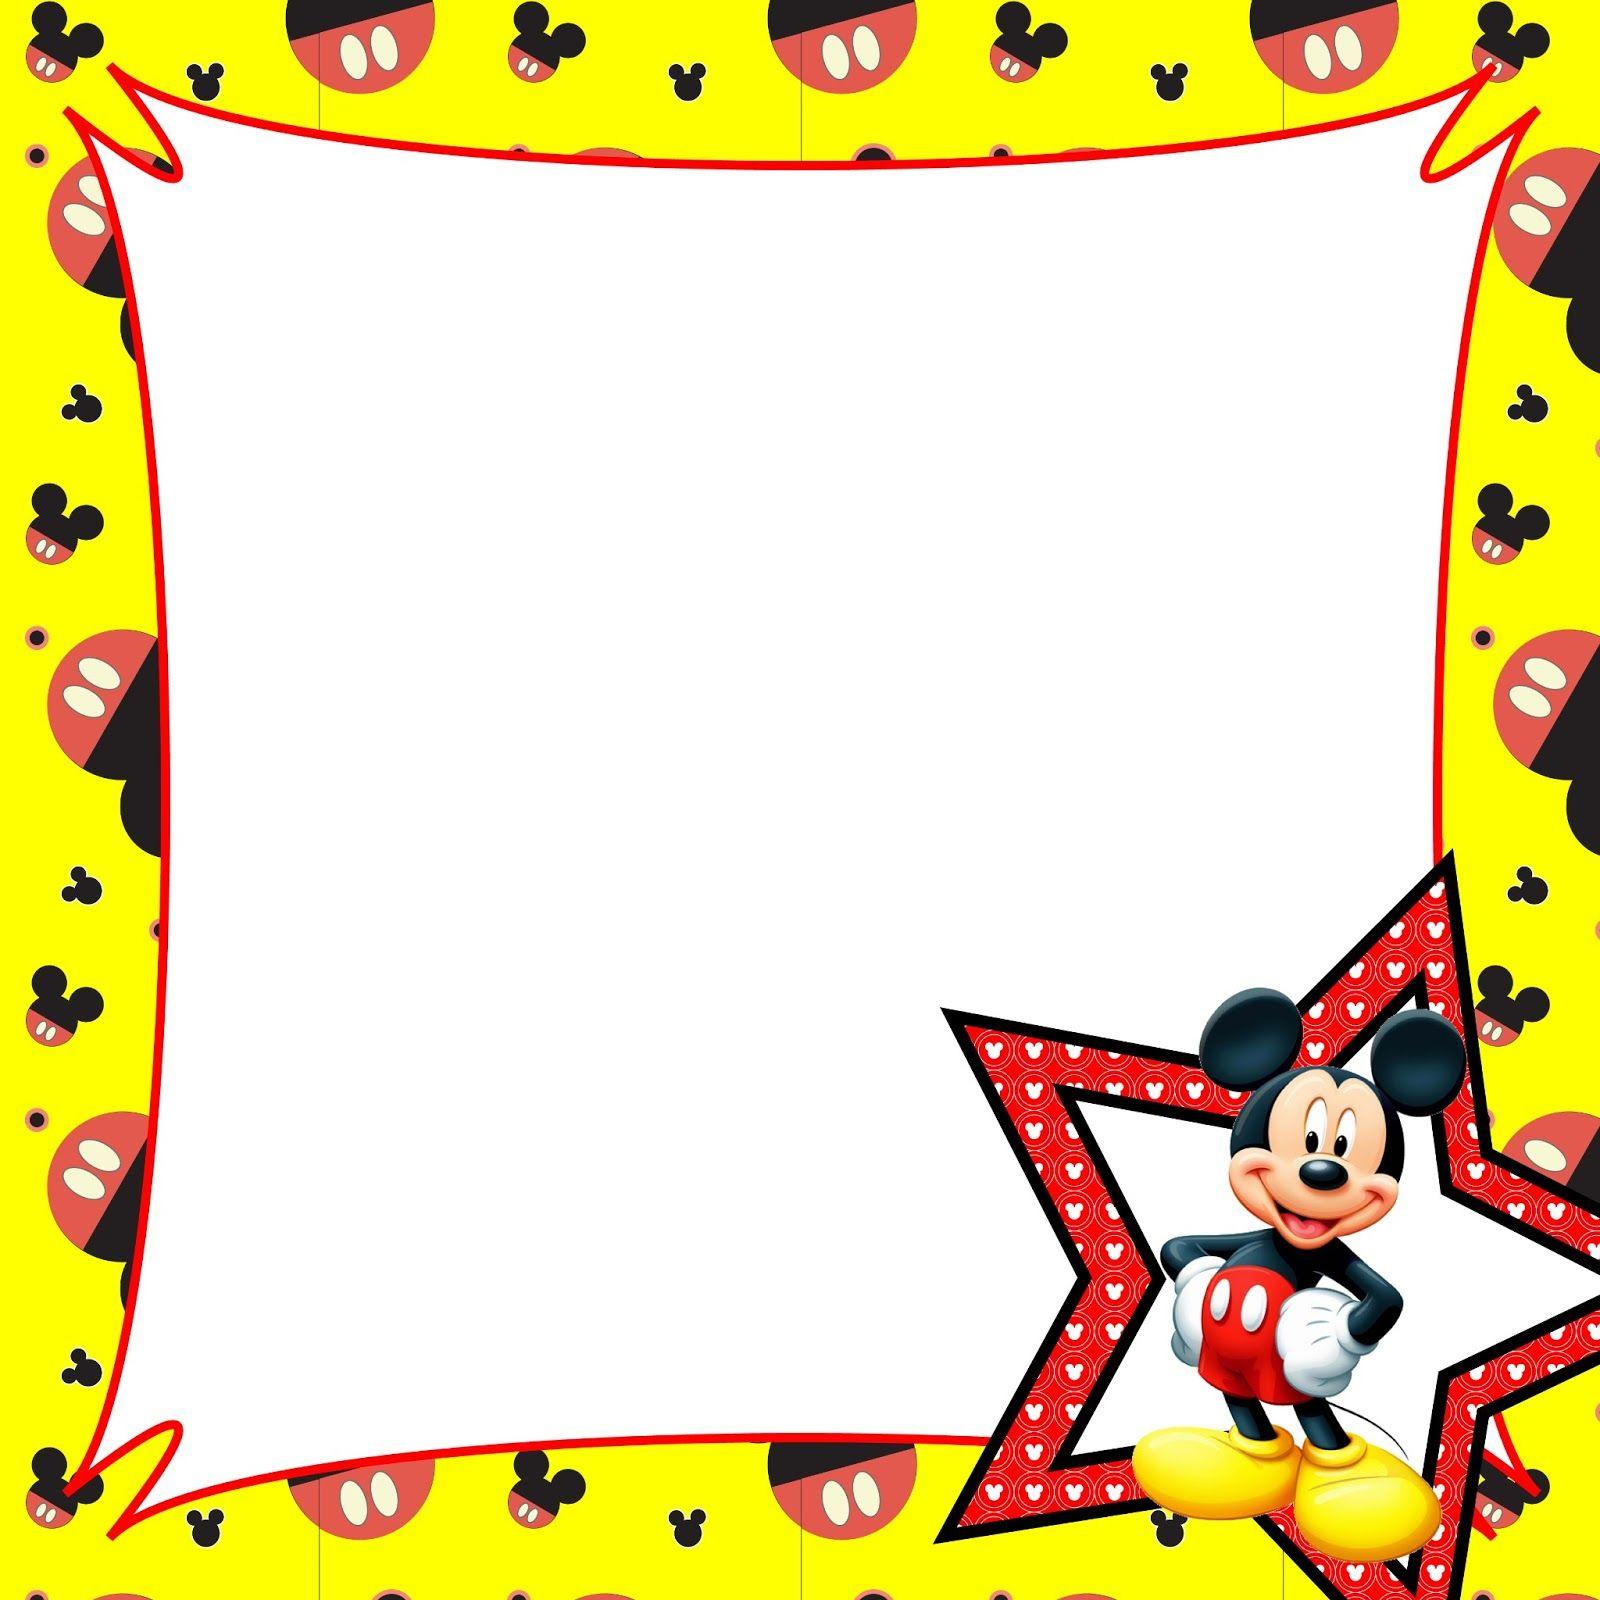 mickey mouse border clip art - photo #2